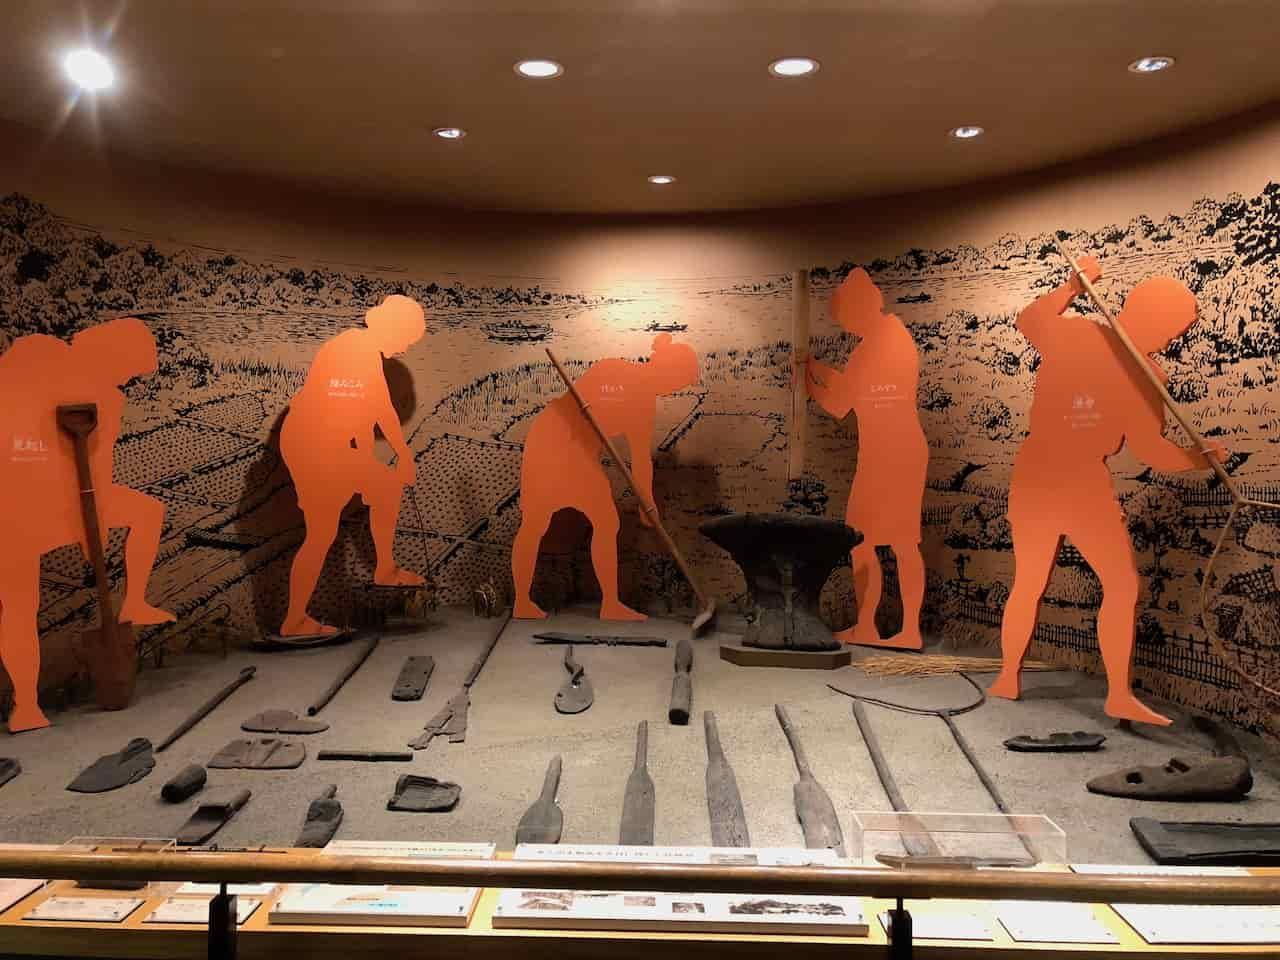 琵琶湖博物館のB展示室